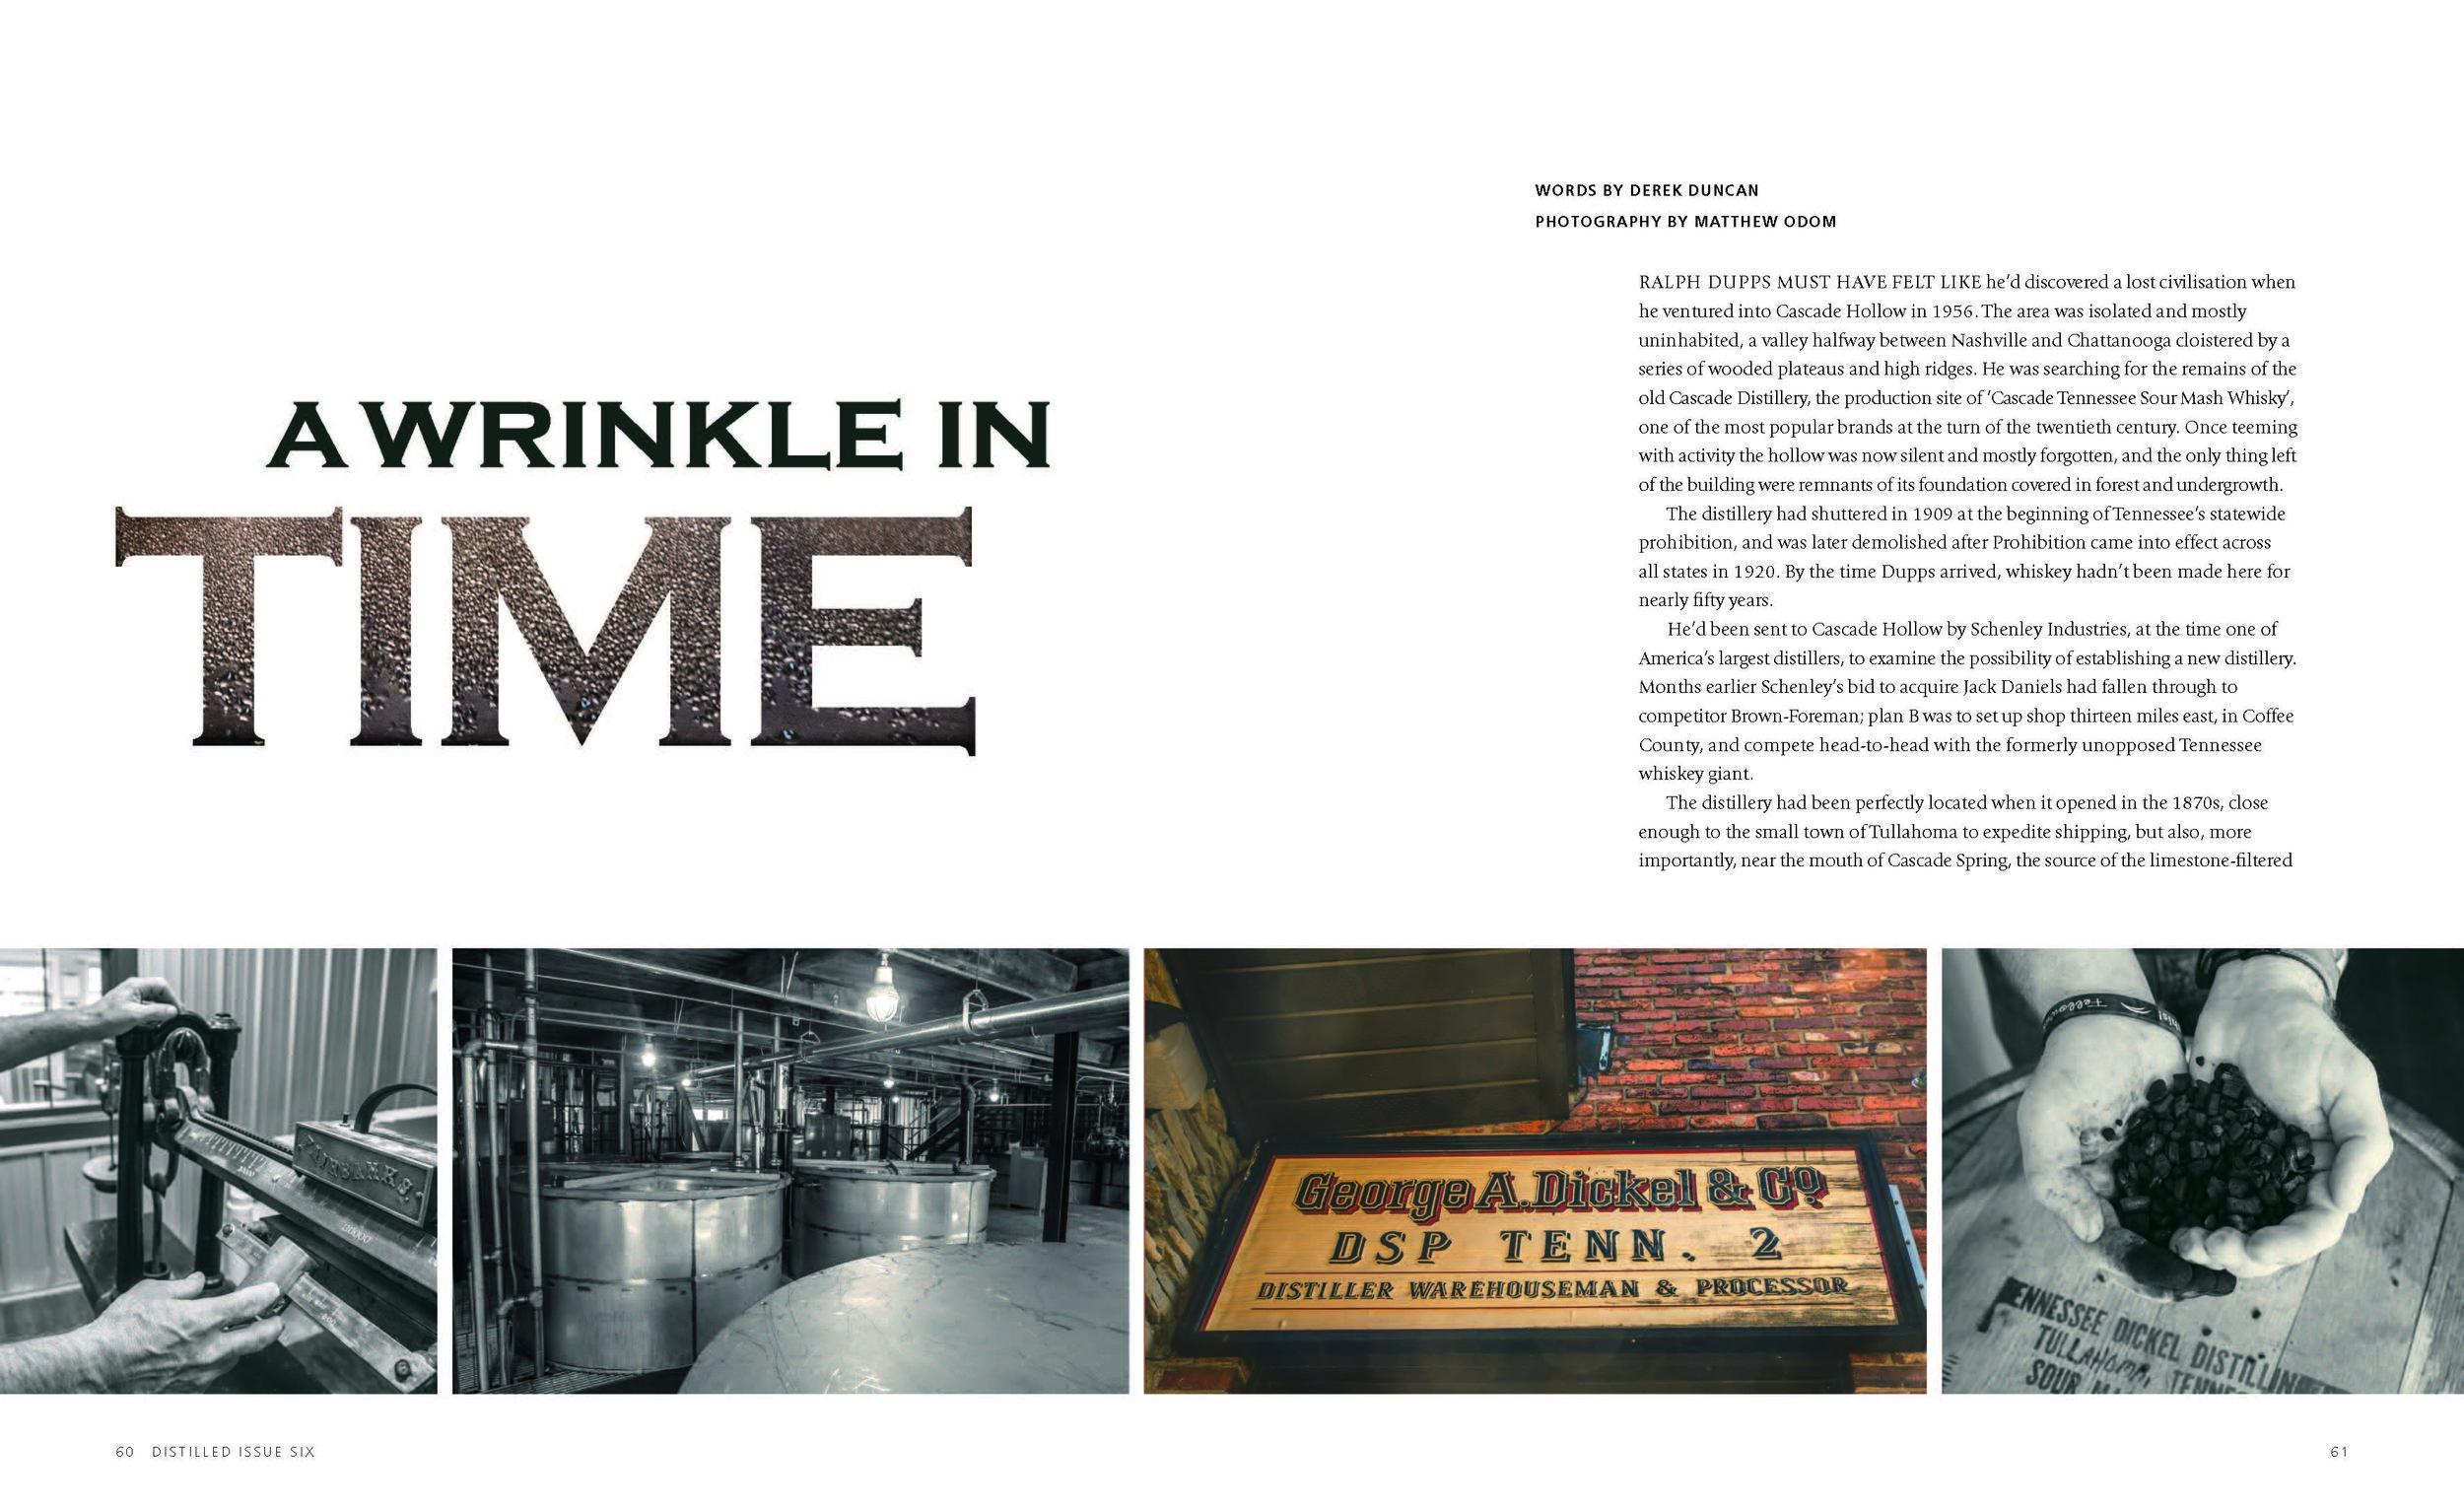 Distilled-IssueSix-Interior-Final-Nov14_Page_31.jpg